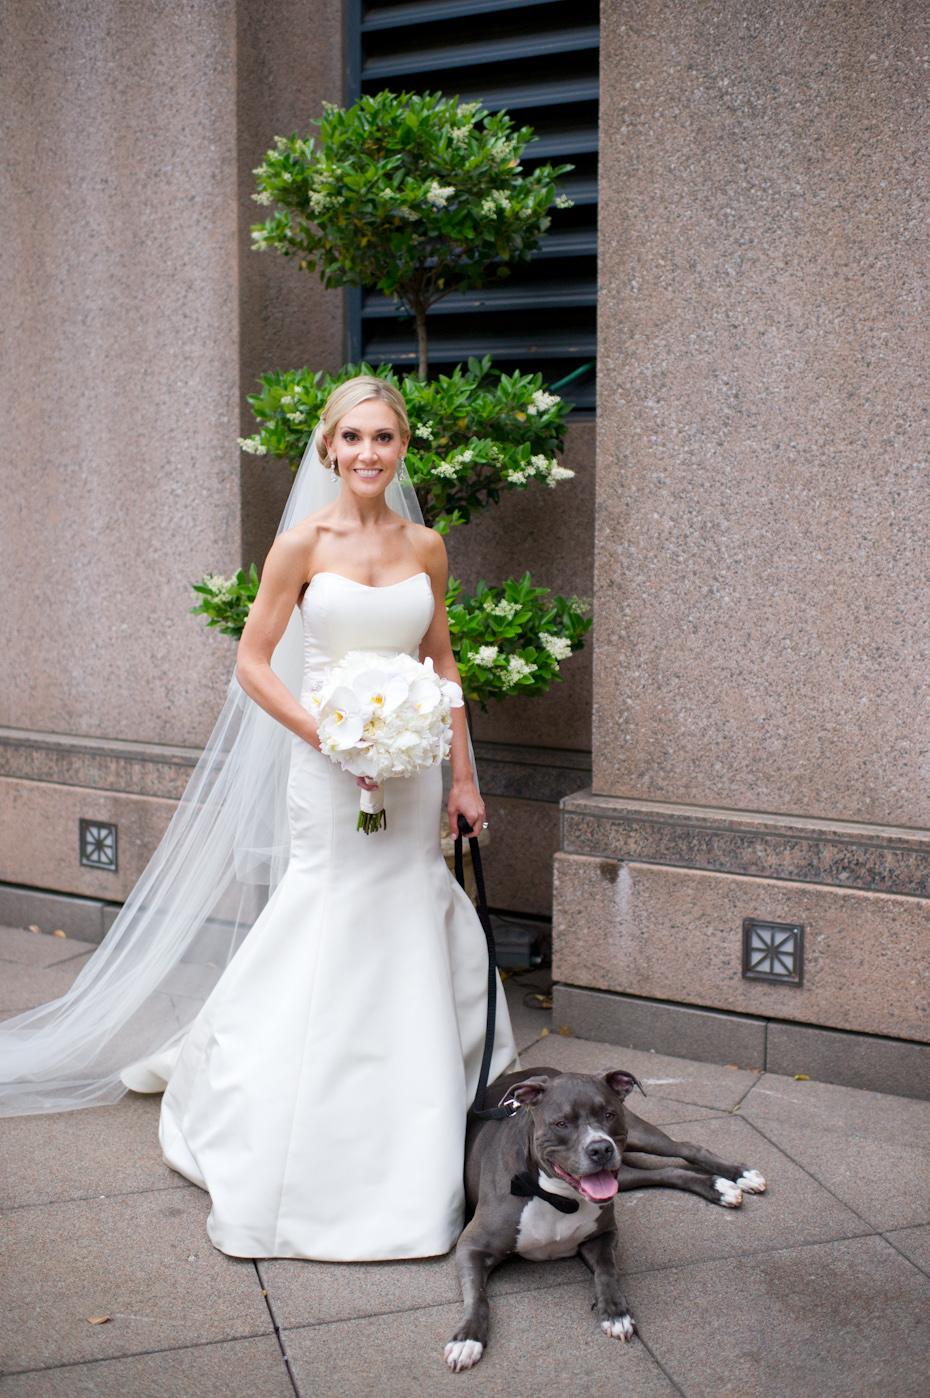 Bride wedding photo with dog